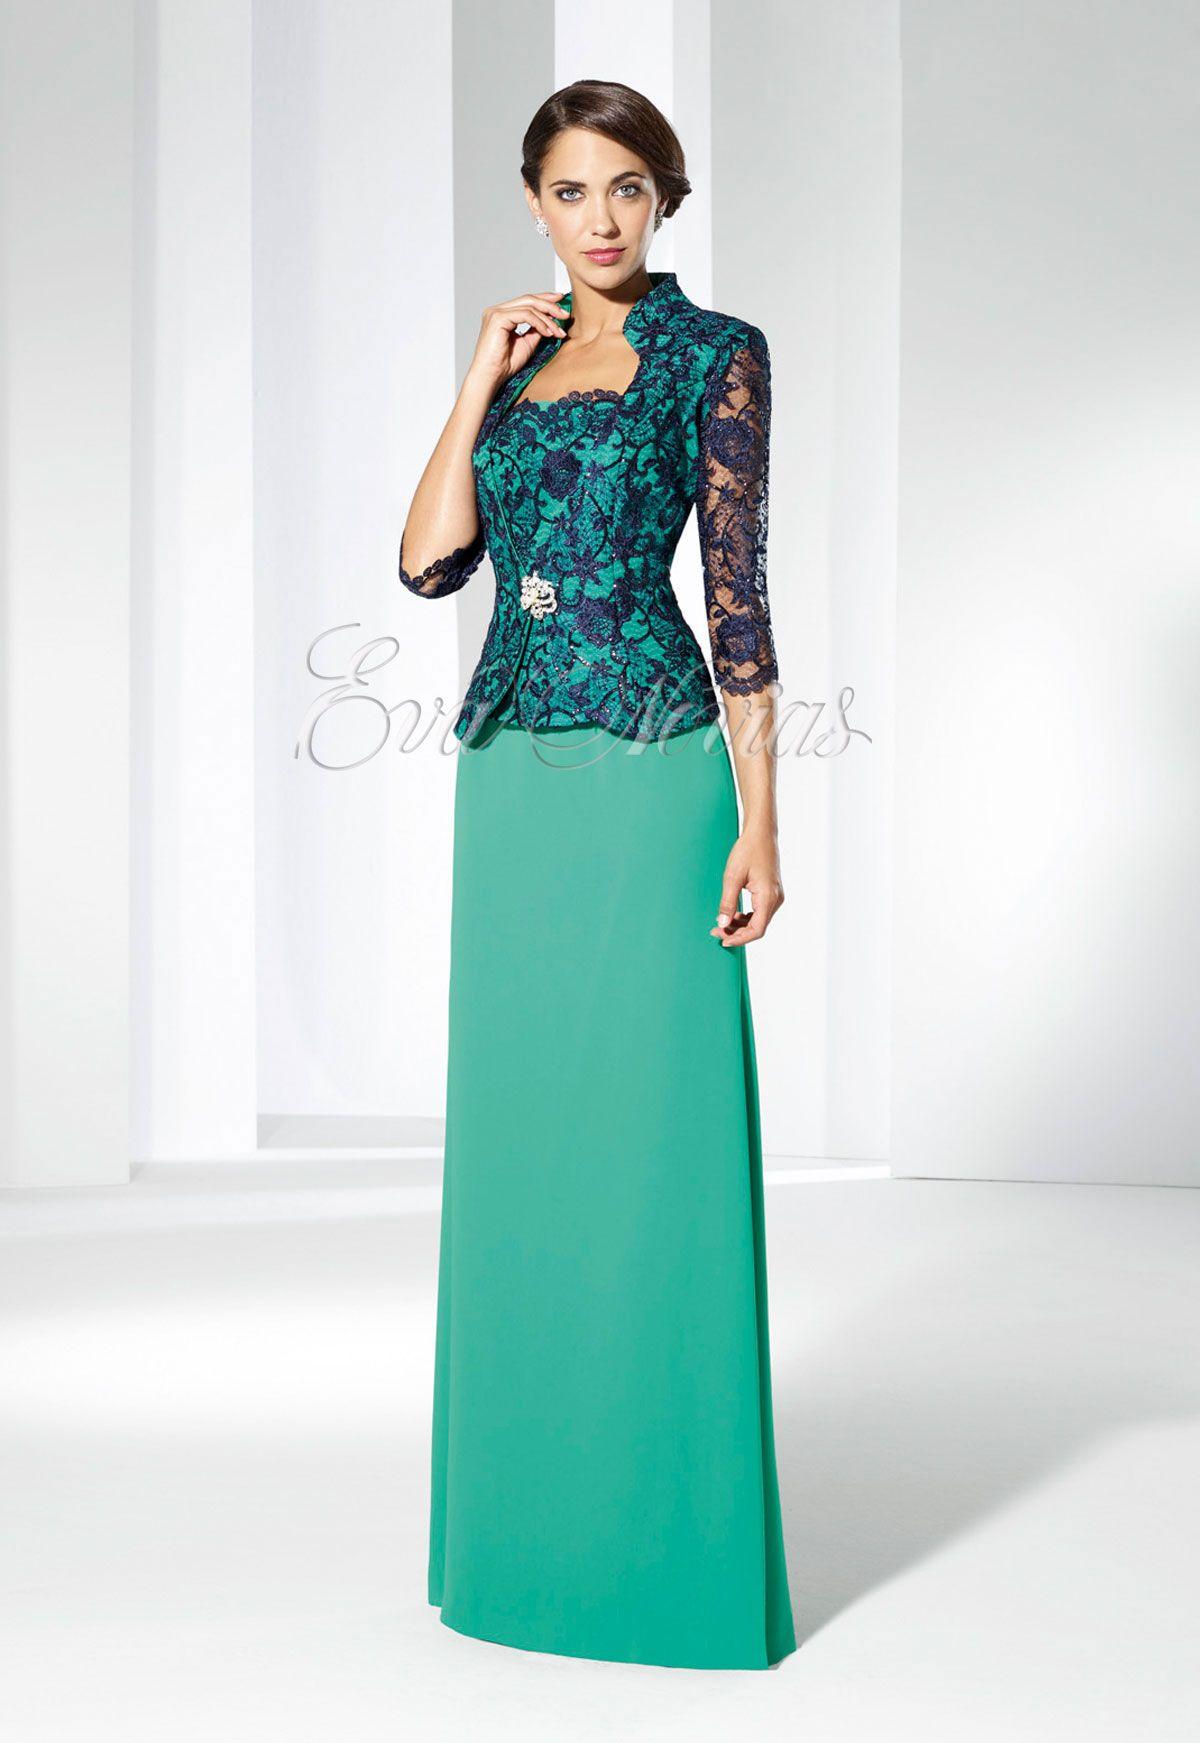 Vestido de fiesta Paloma Camacho 2016 Modelo 2737 en Eva Novias ...